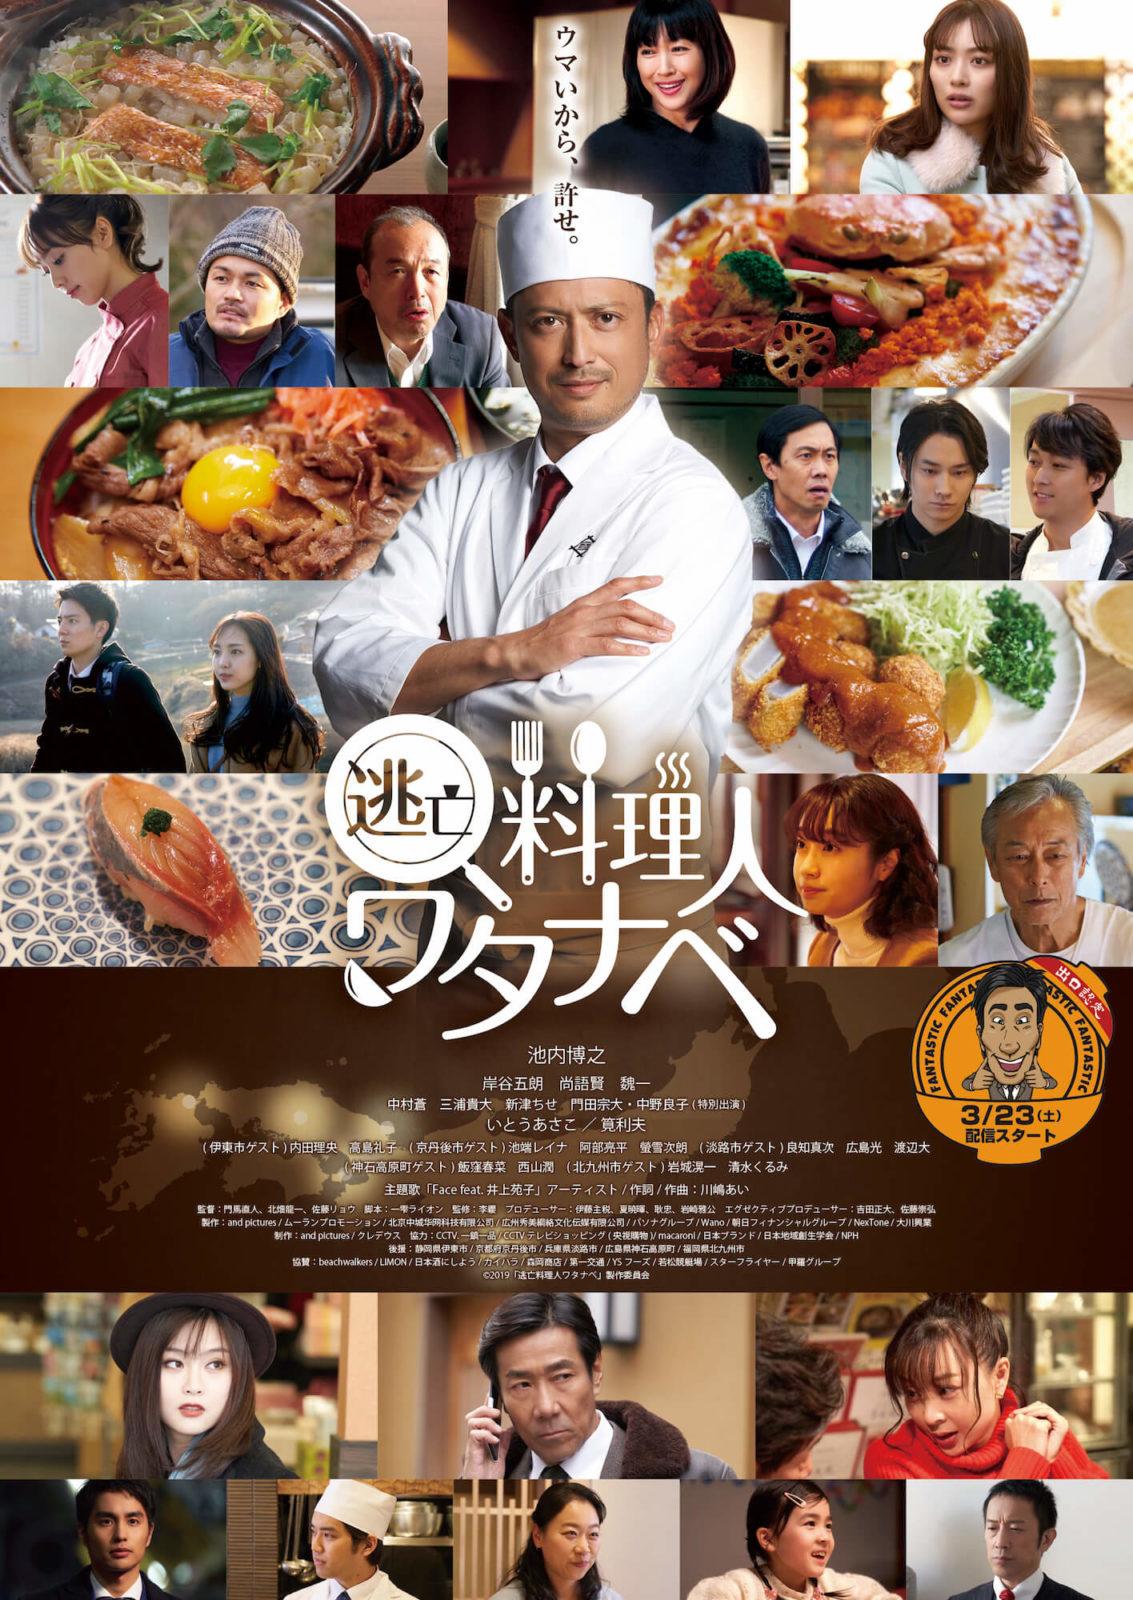 TABARU、新曲『タバルほおばる』が池内博之主演の日中合作ドラマ「逃亡料理人ワタナベ」の挿入歌&スピンオフ番組主題歌に決定画像87109